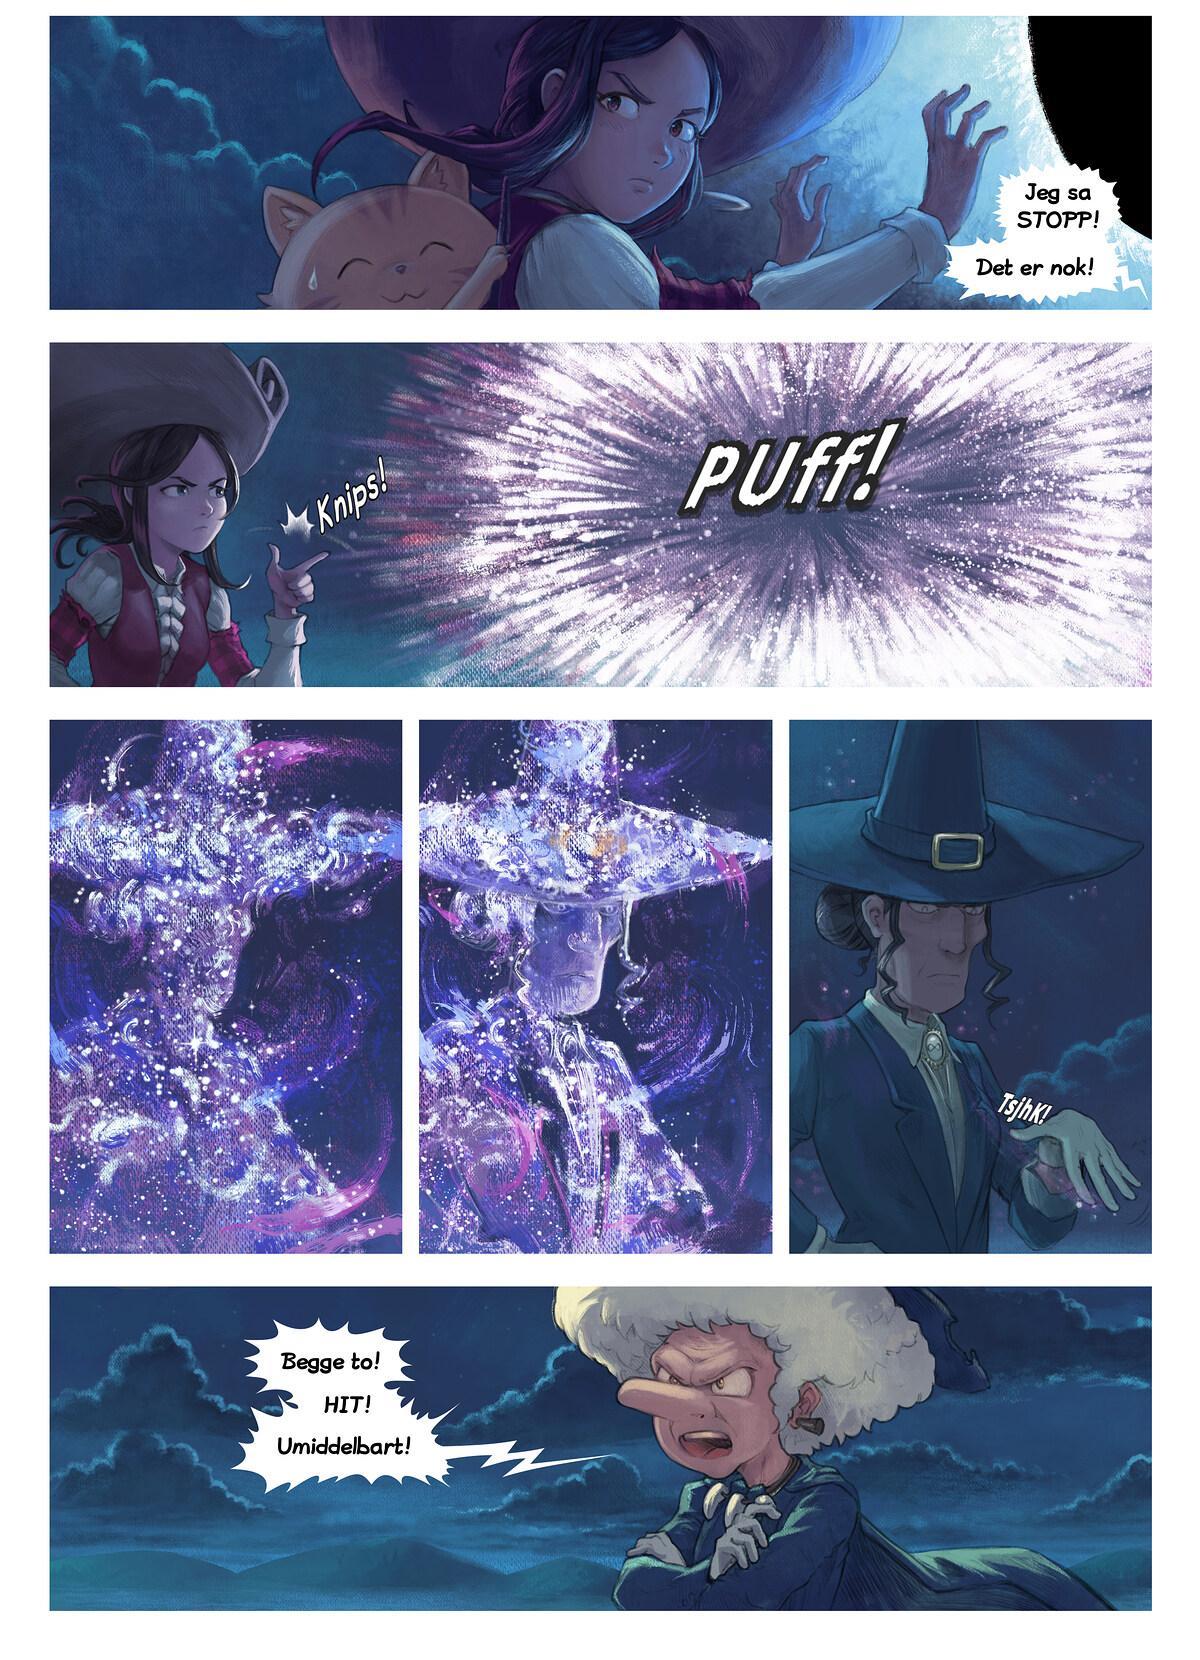 Episode 31: Den store kampen, Page 6